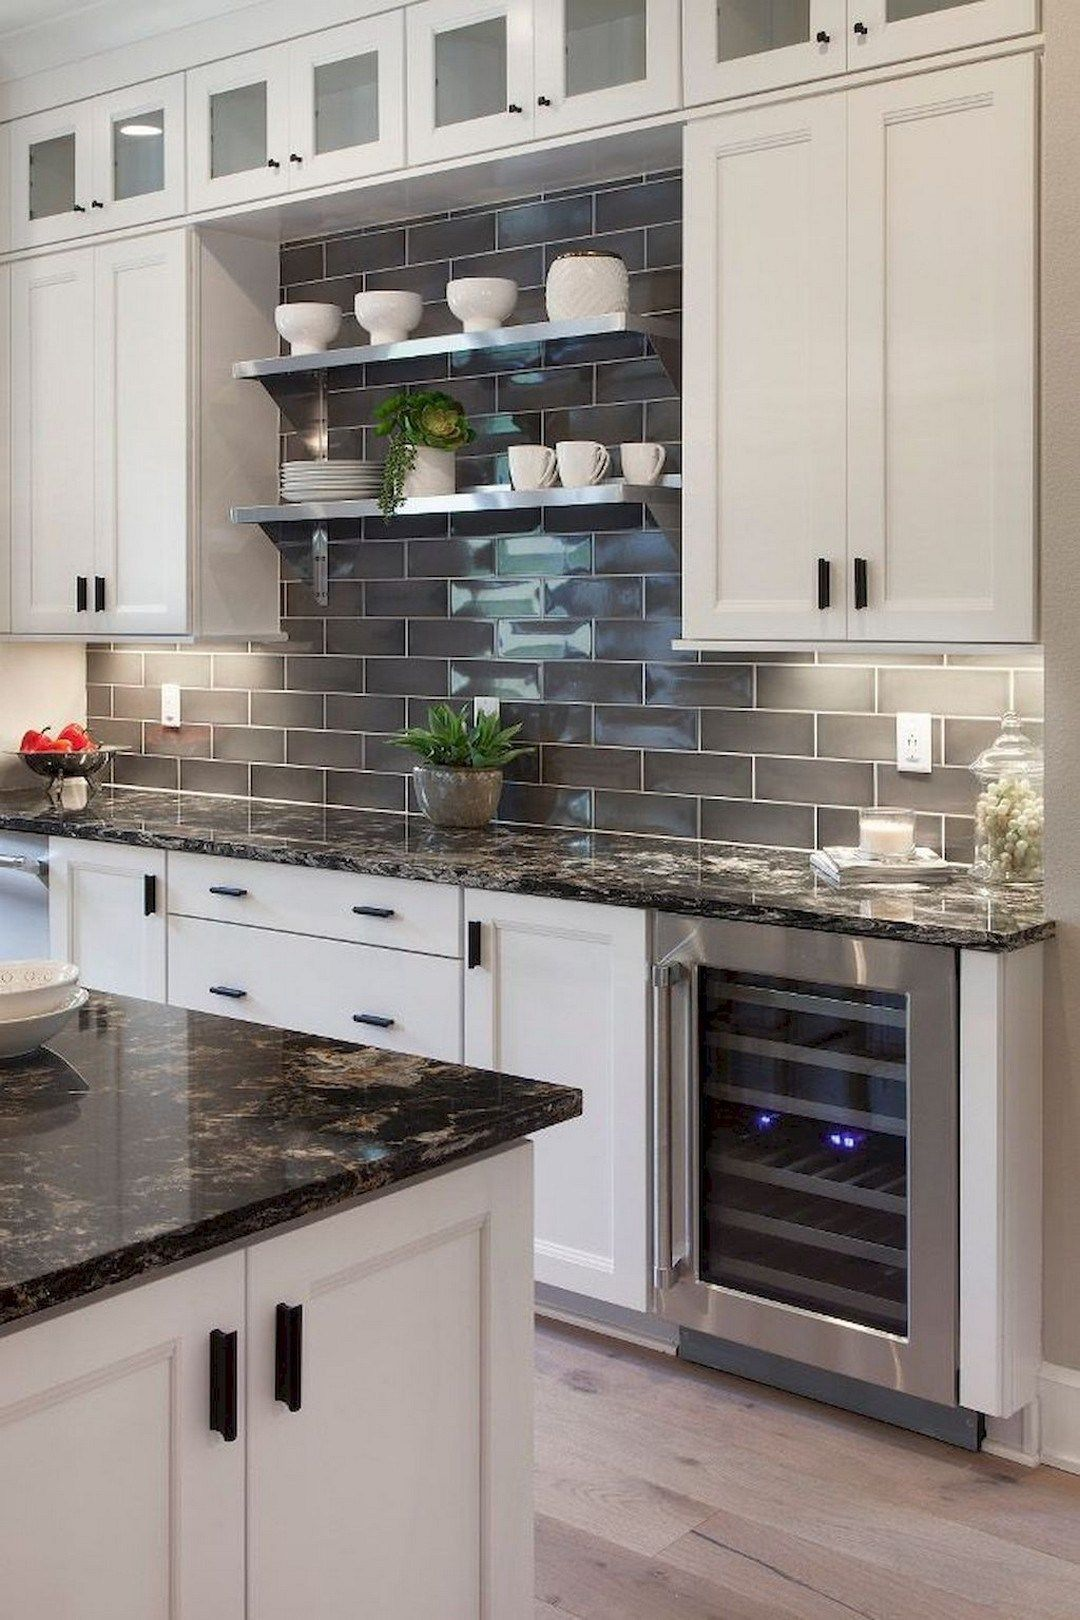 29 Cool Cheap Diy Kitchen Backsplash Ideas 7 In 2020 Kitchen Cabinets Decor Diy Kitchen Backsplash Kitchen Backsplash